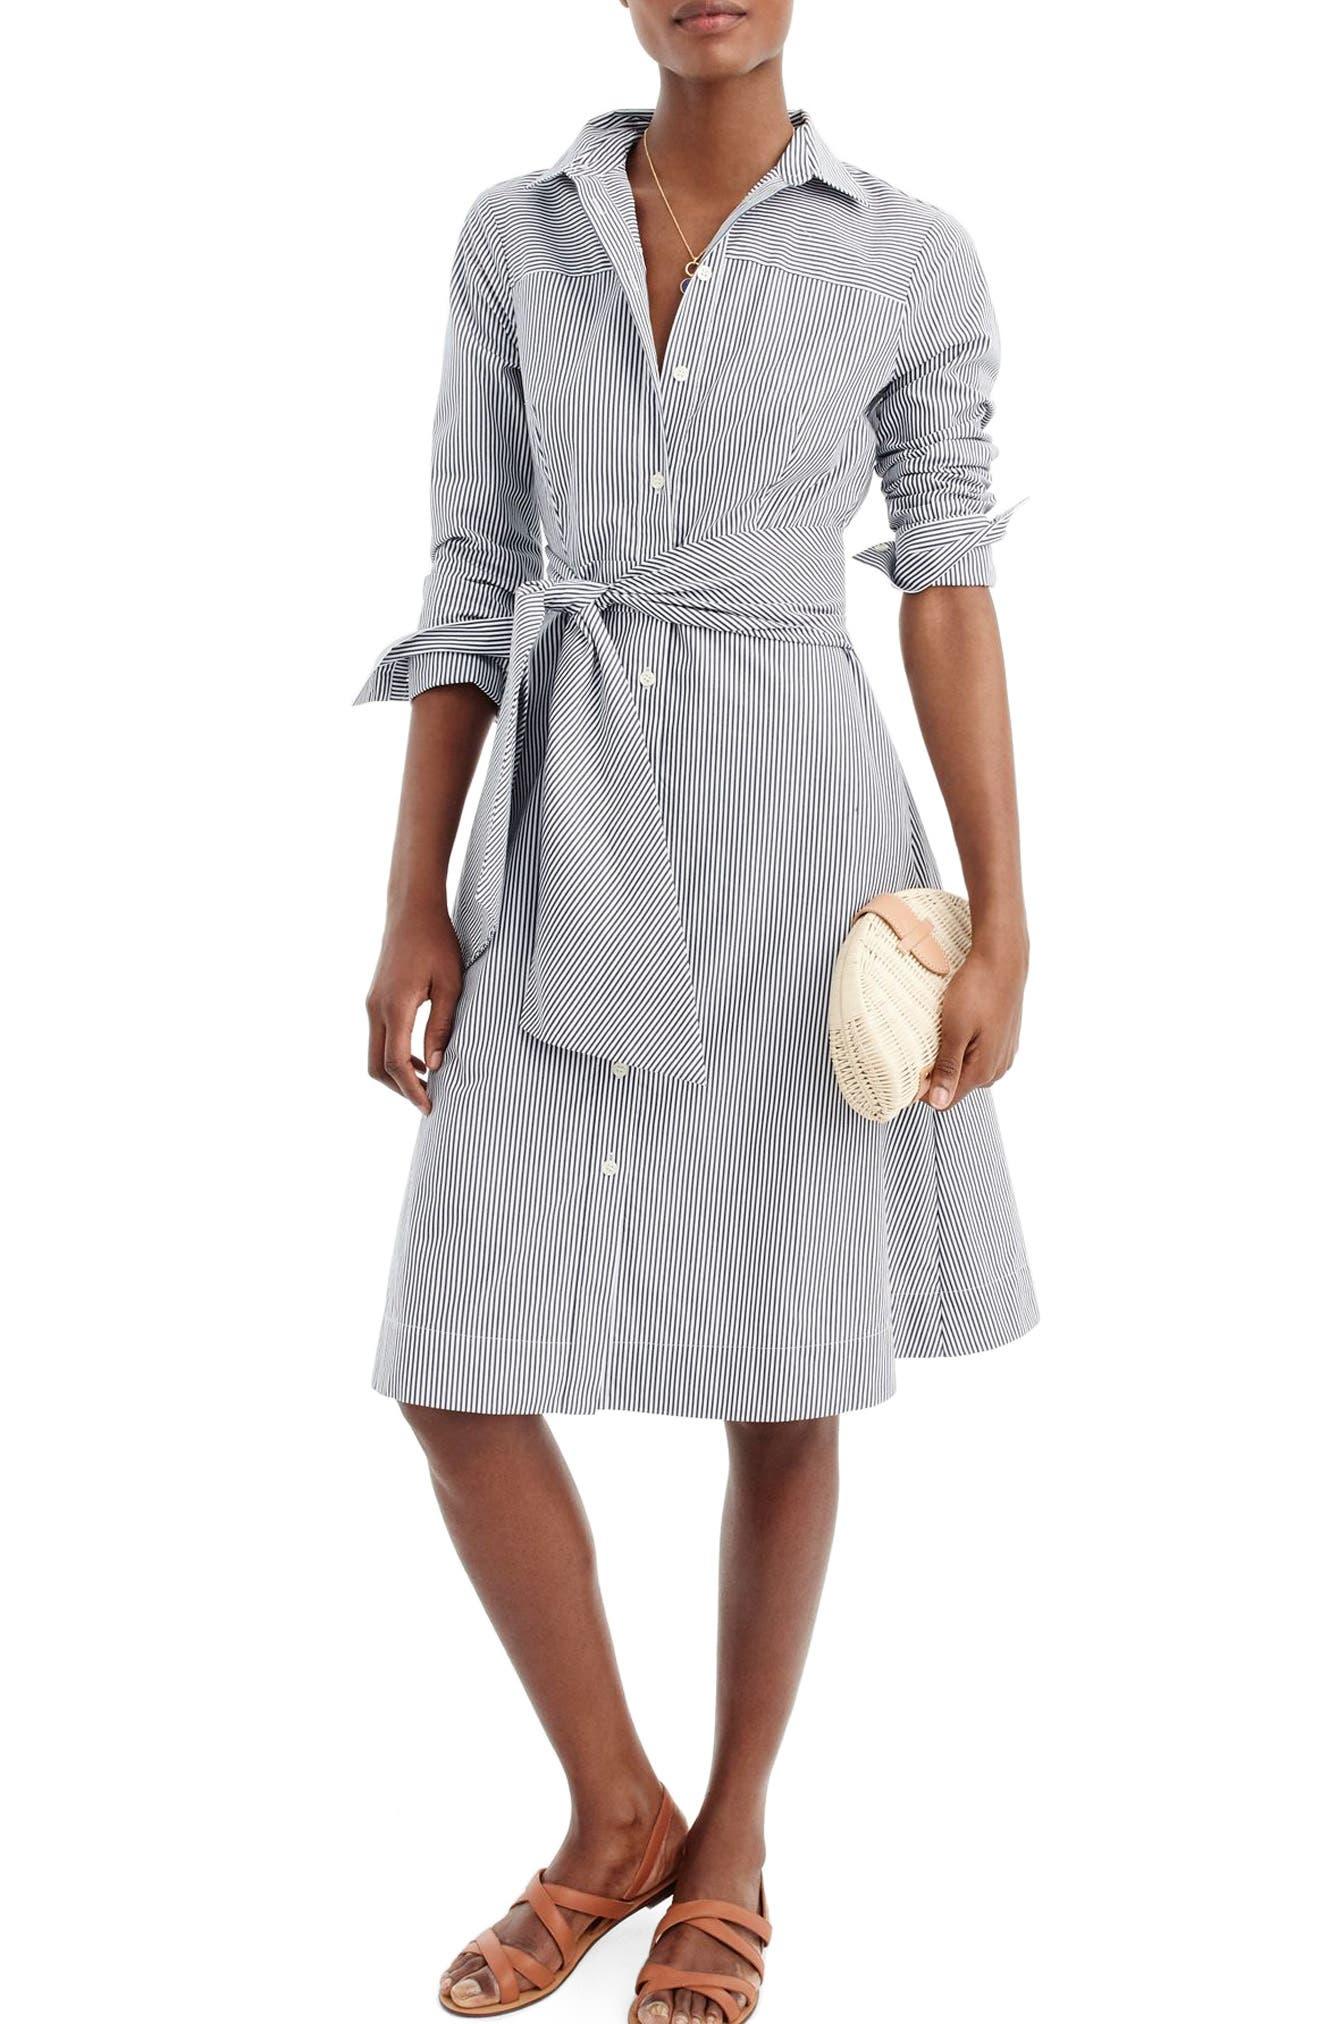 J.CREW Stripe Tie-Waist Shirtdress, Main, color, WHITE NAVY